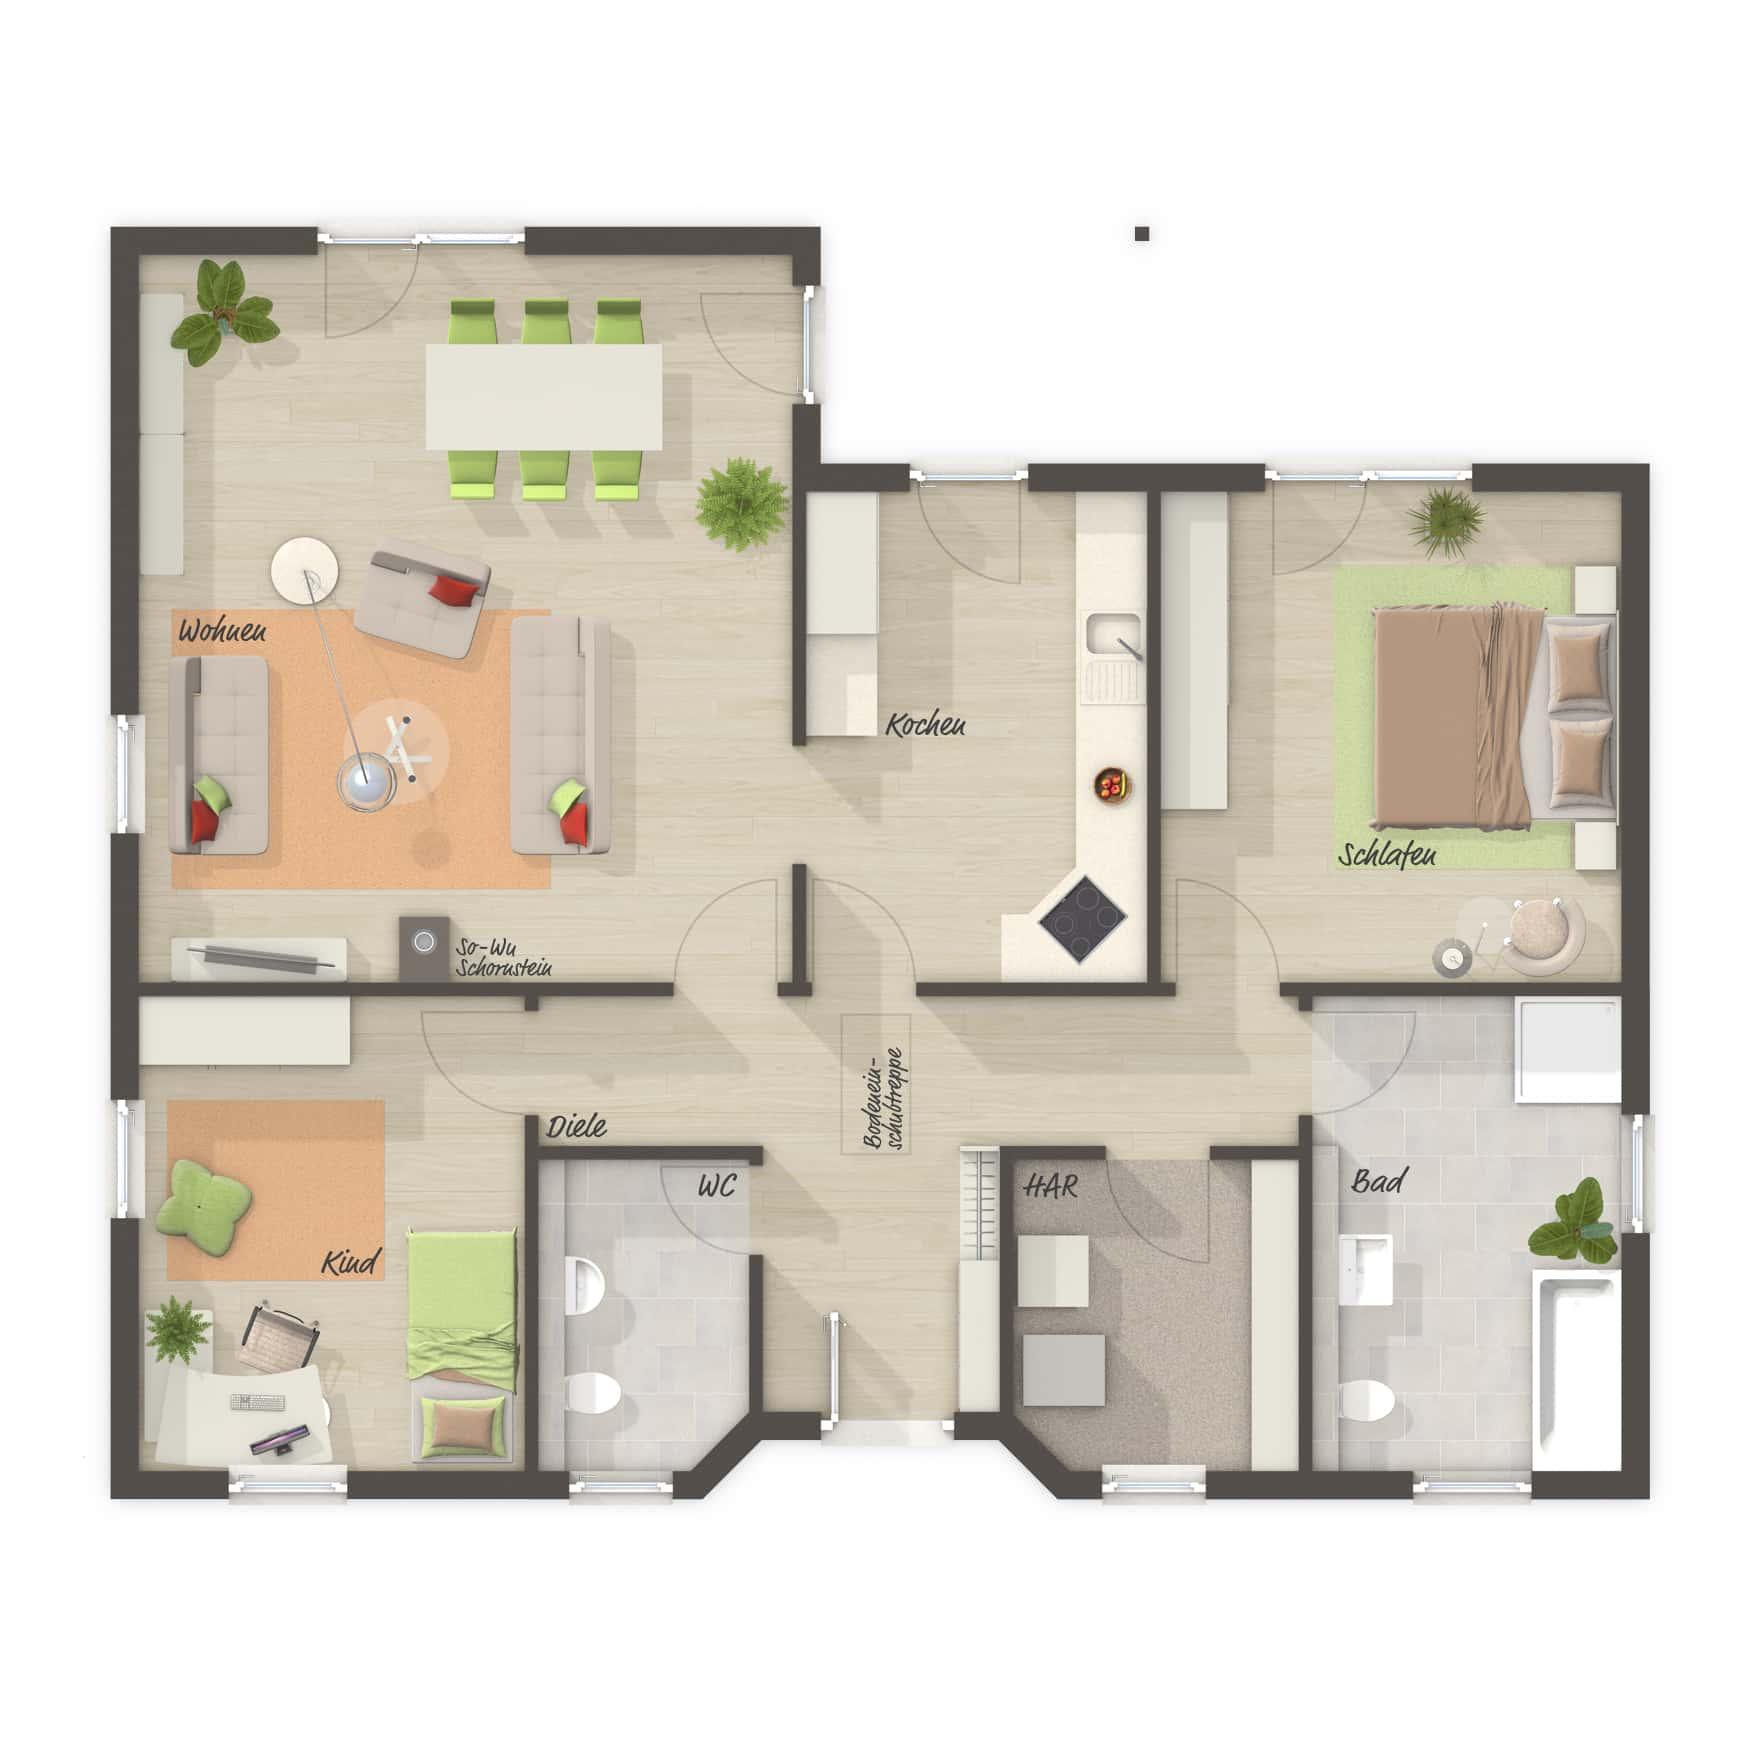 Grundriss Bungalow 3 Zimmer, 108 qm - Massivhaus Winkelbungalow 108 Town Country Haus - HausbauDirekt.de